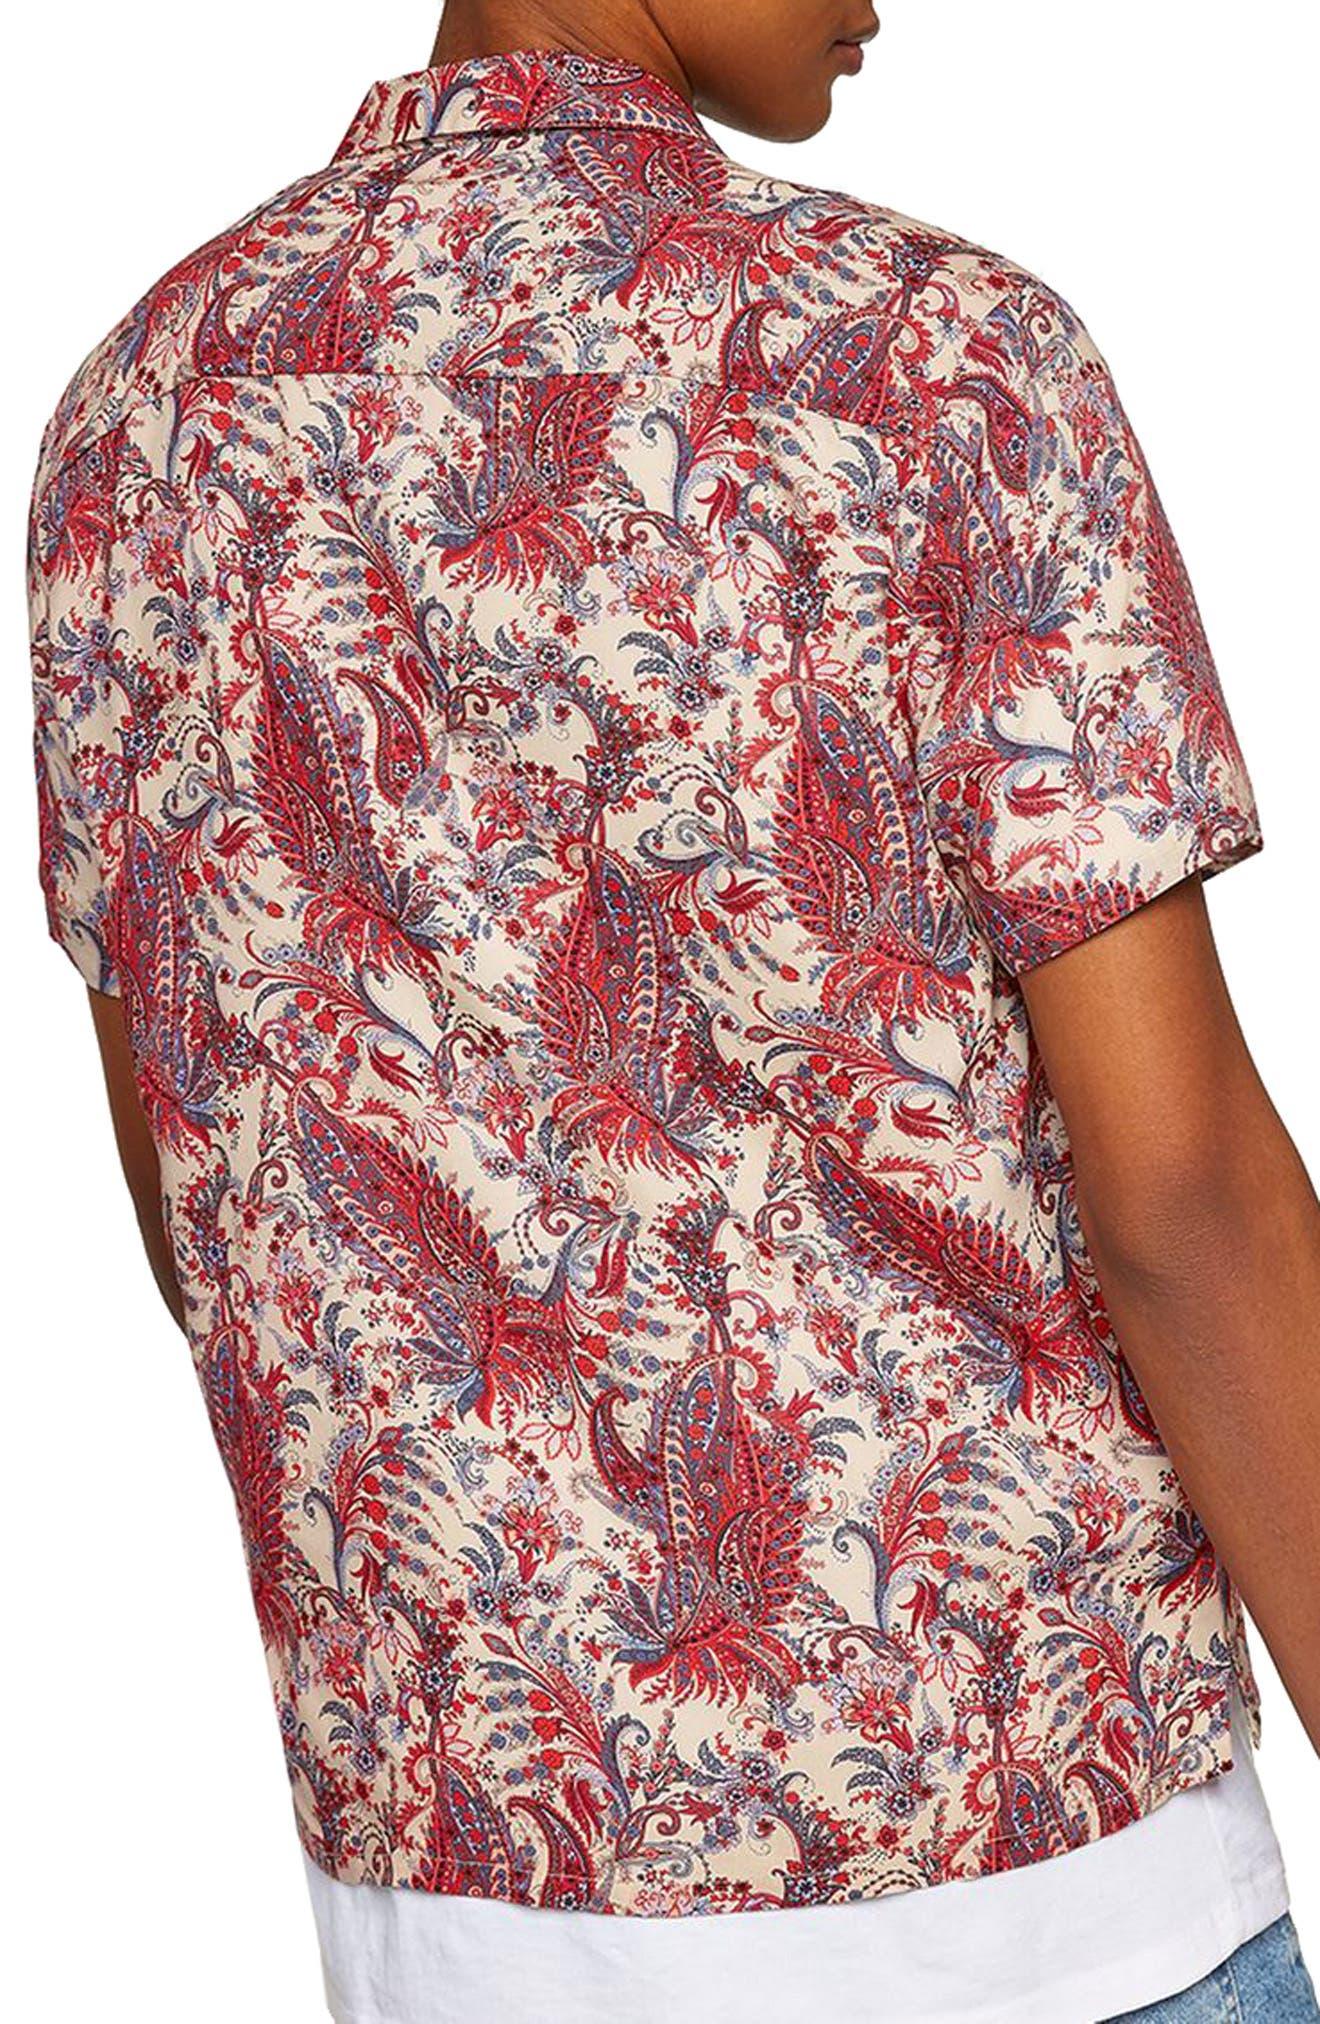 Paisley Camp Shirt,                             Alternate thumbnail 2, color,                             PINK MULTI